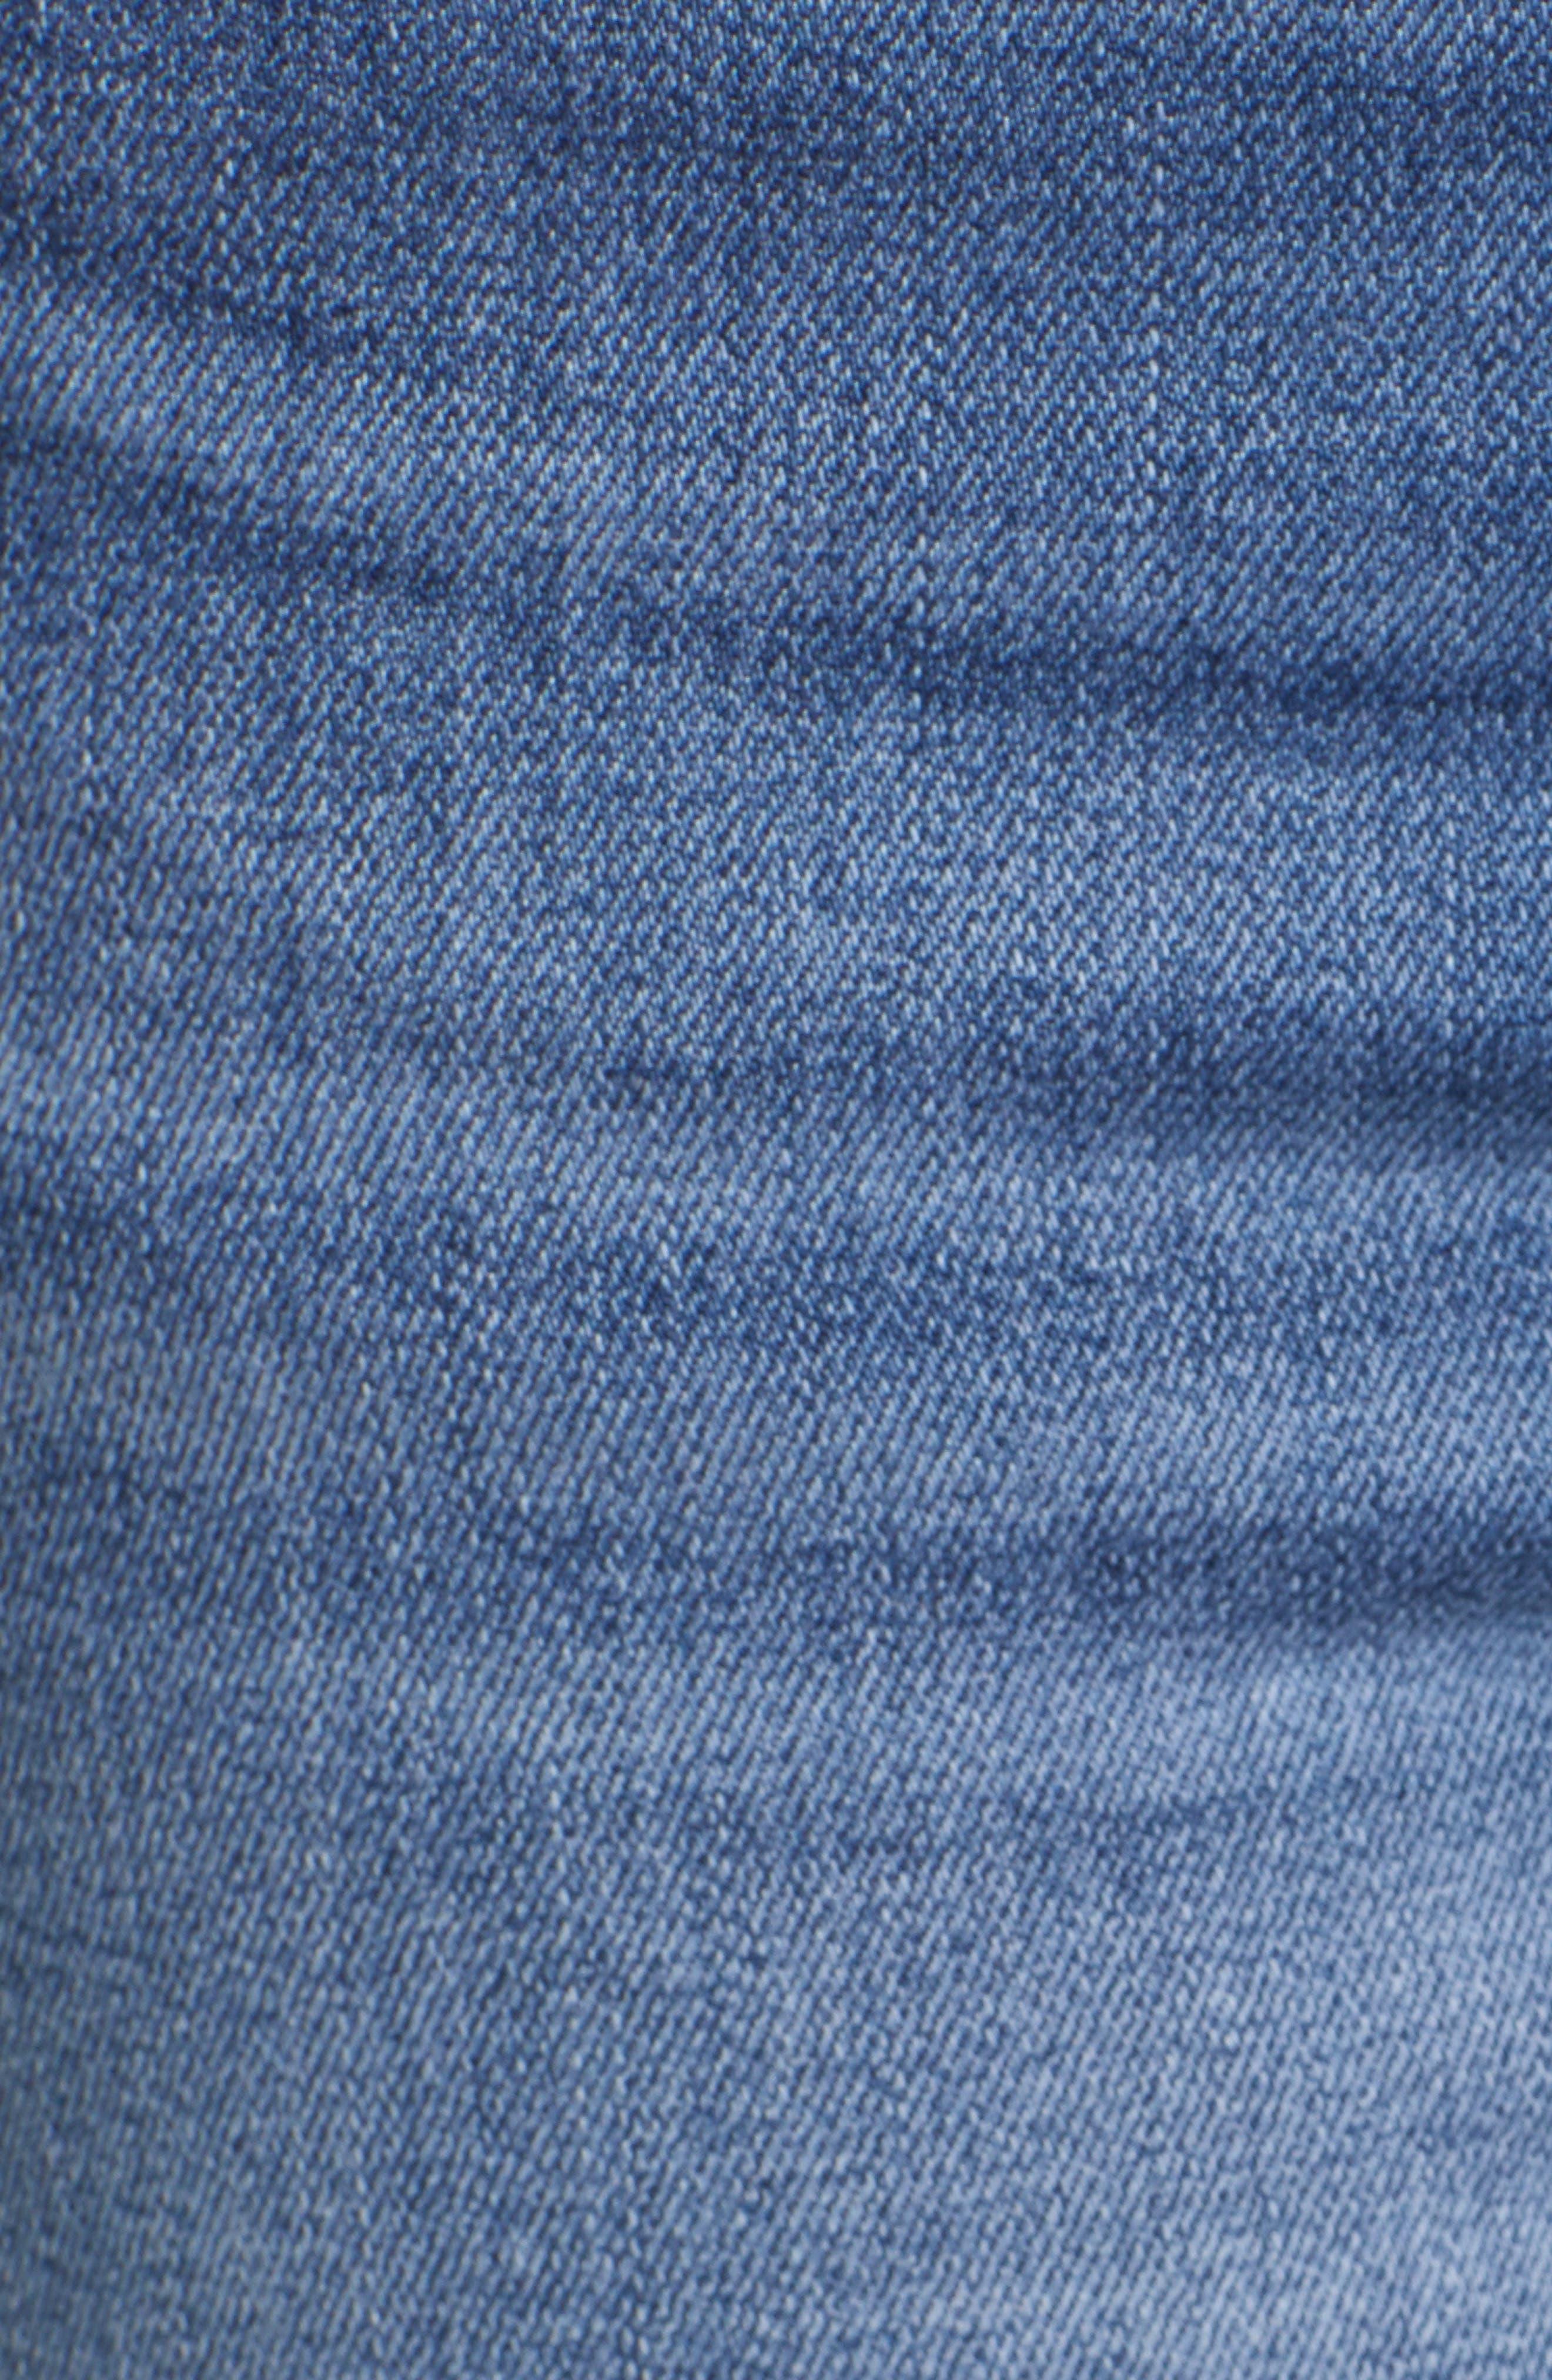 Crop Skinny Jeans,                             Alternate thumbnail 6, color,                             MEDIUM WASH